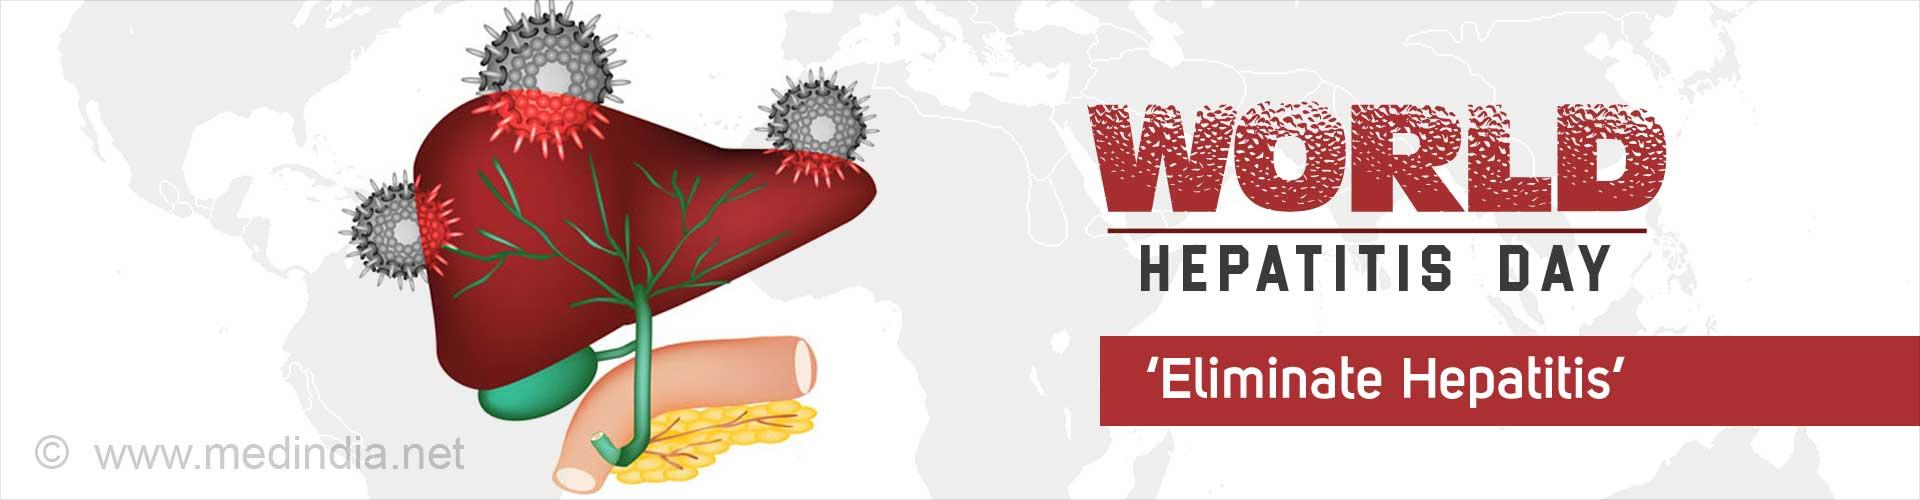 World Hepatitis Day 2017 - Exclusive Interview With Dr. Ambrose Pradeep